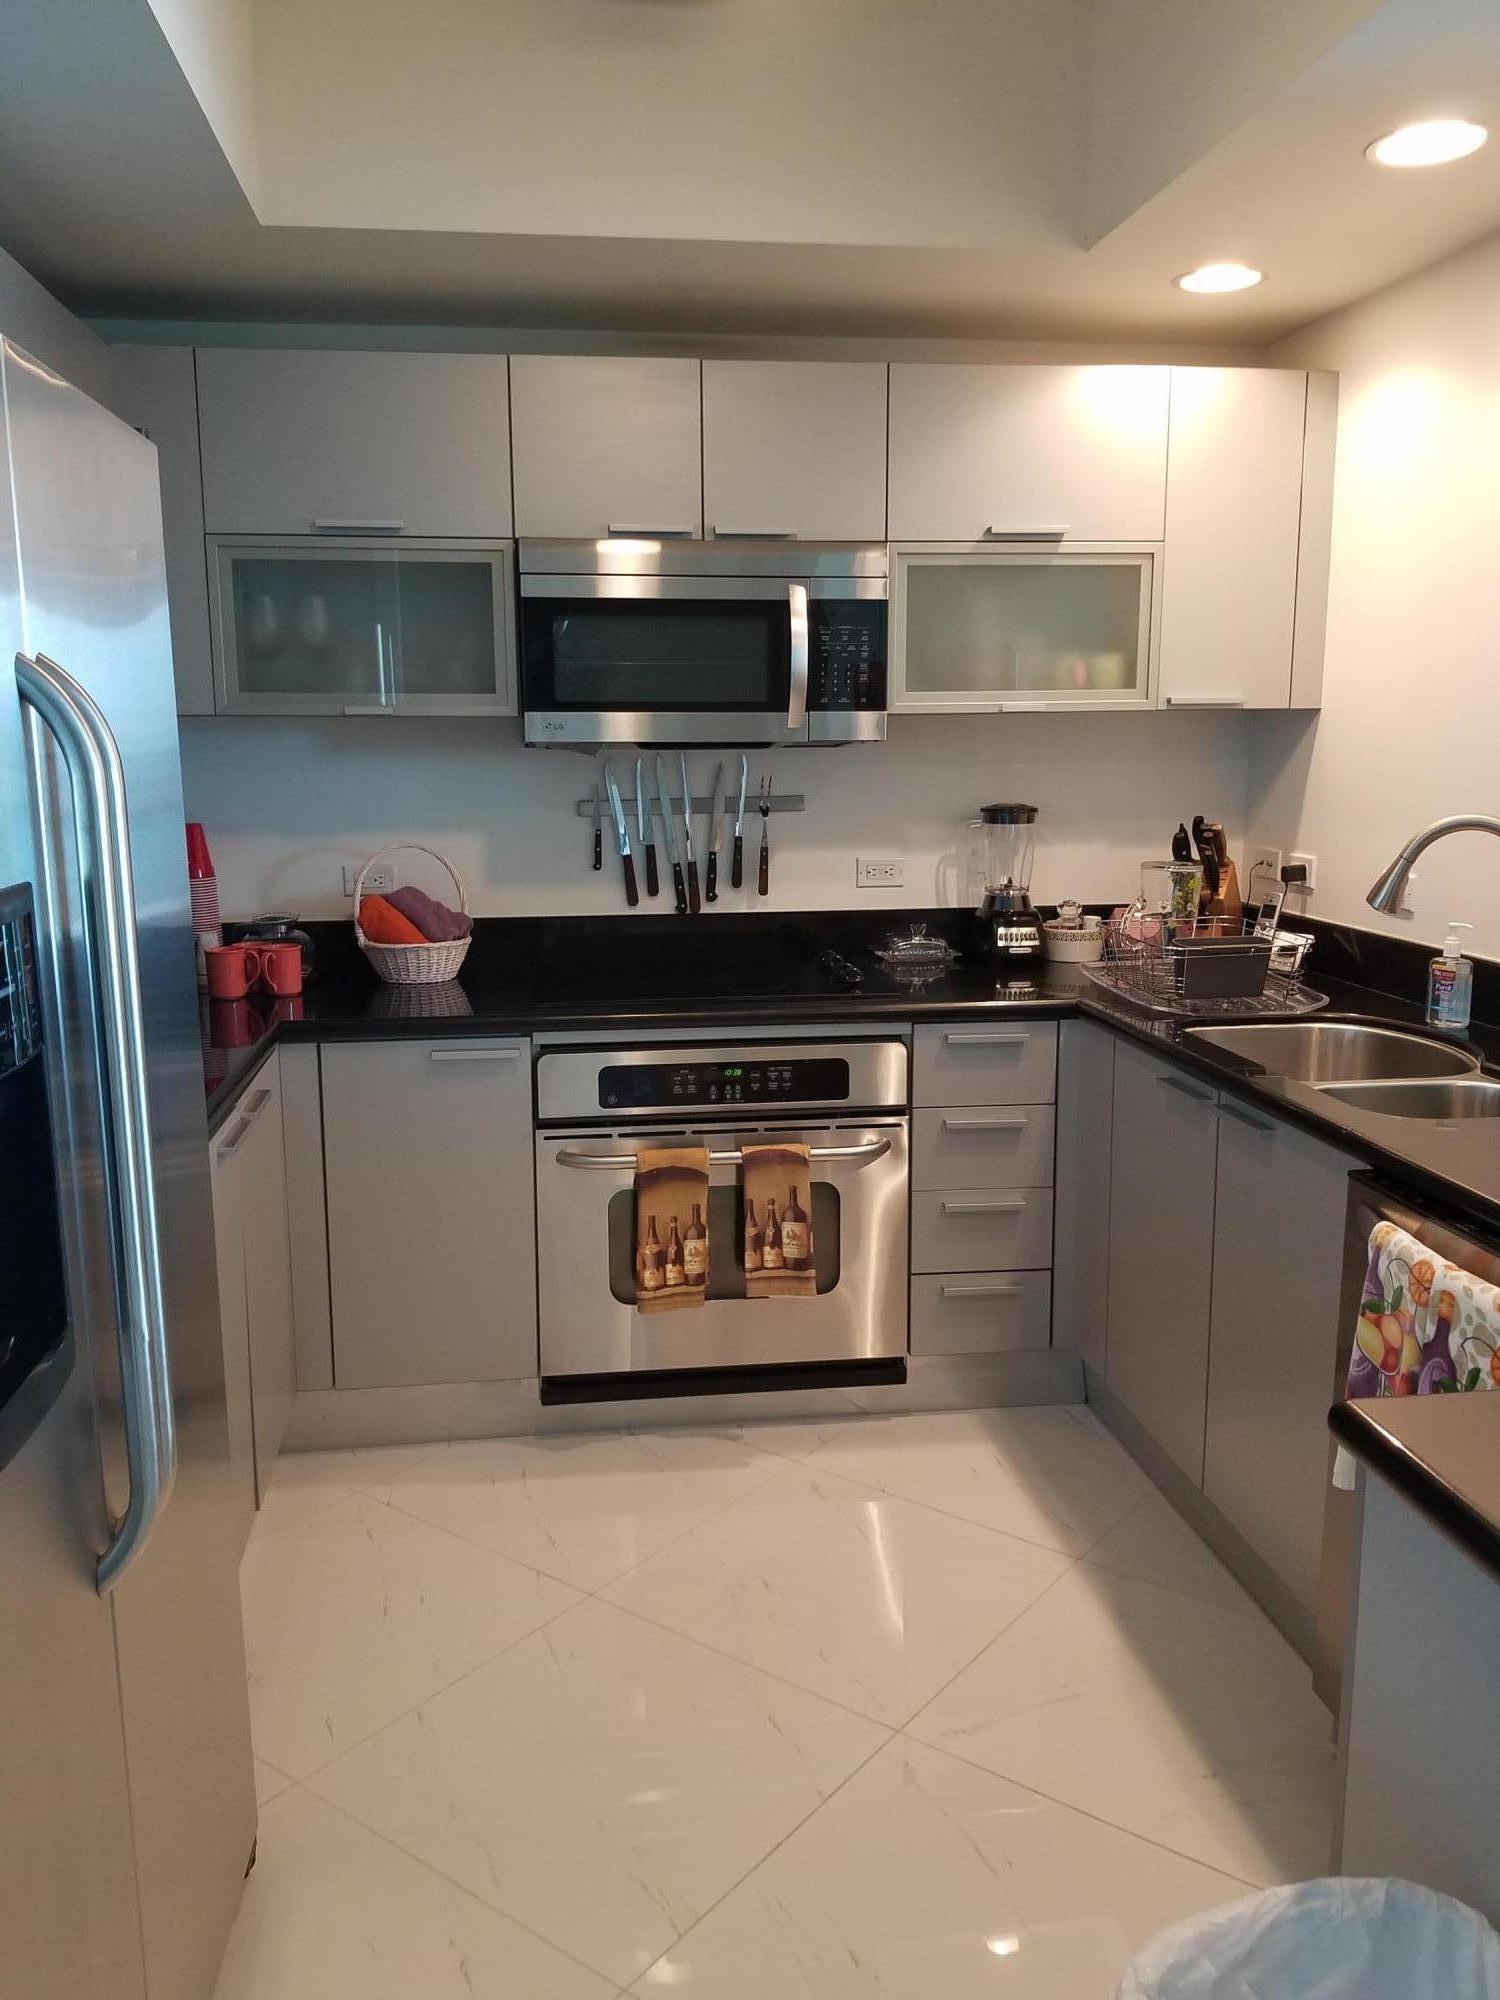 2650 Lake Shore Drive 1601, Riviera Beach, Florida 33404, 2 Bedrooms Bedrooms, ,2 BathroomsBathrooms,A,Condominium,Lake Shore,RX-10555869